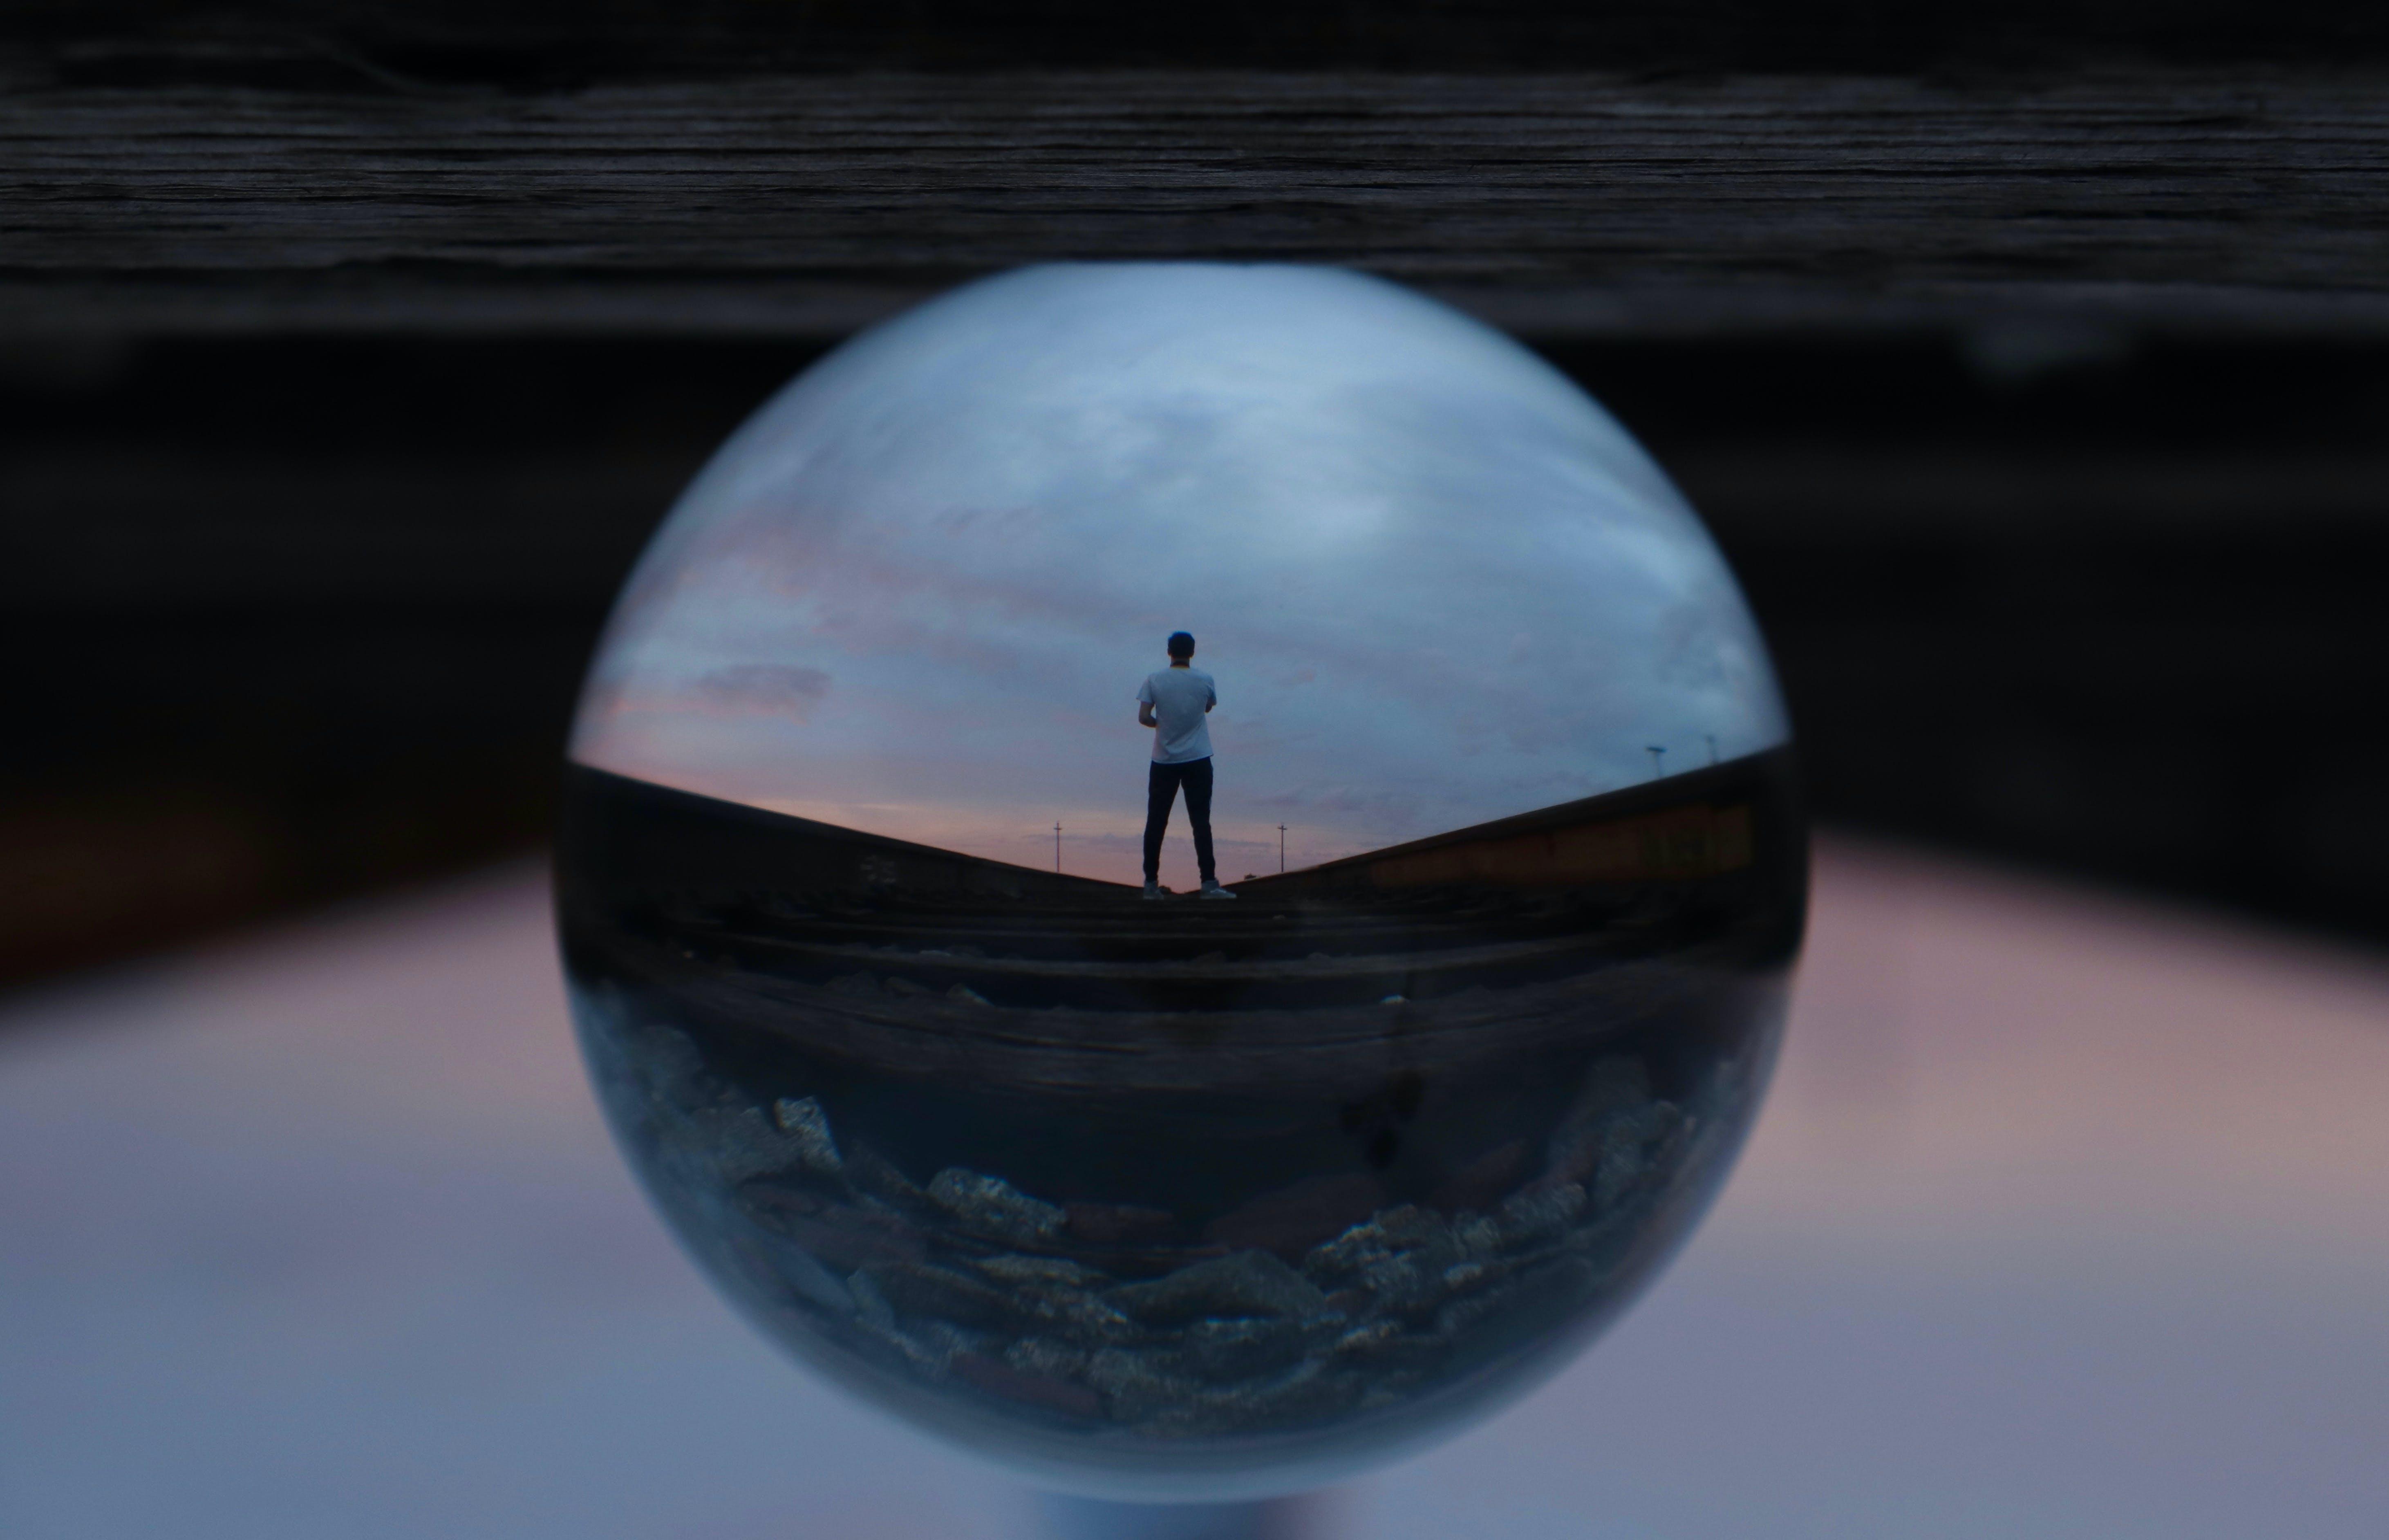 Round Glass Ball Reflecting Man Standing